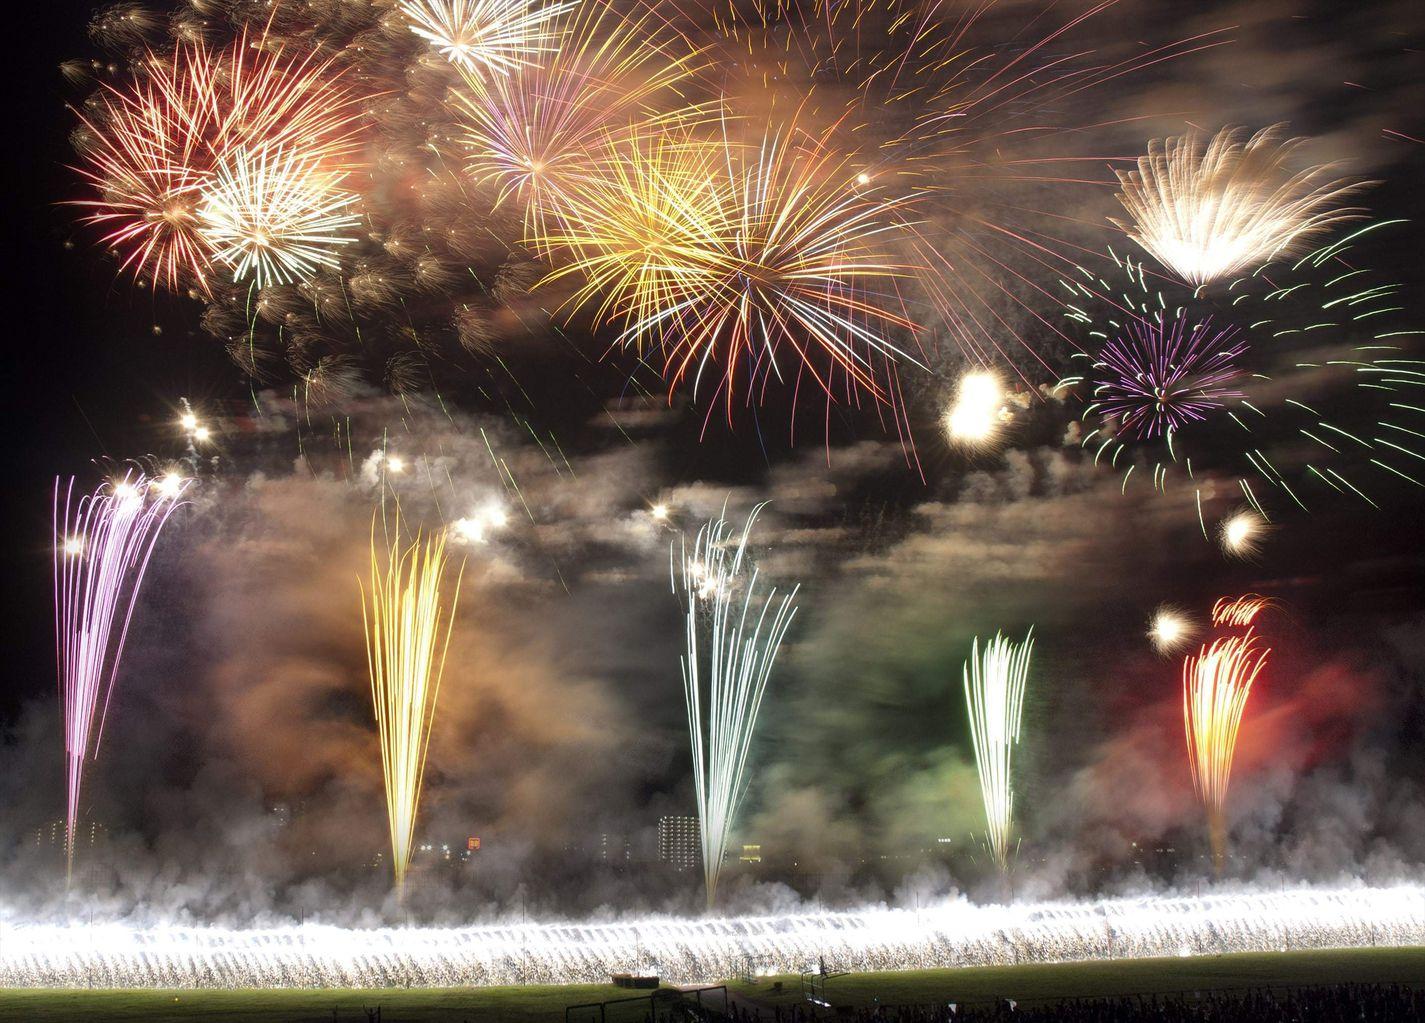 Ashikaga Fireworks Festival